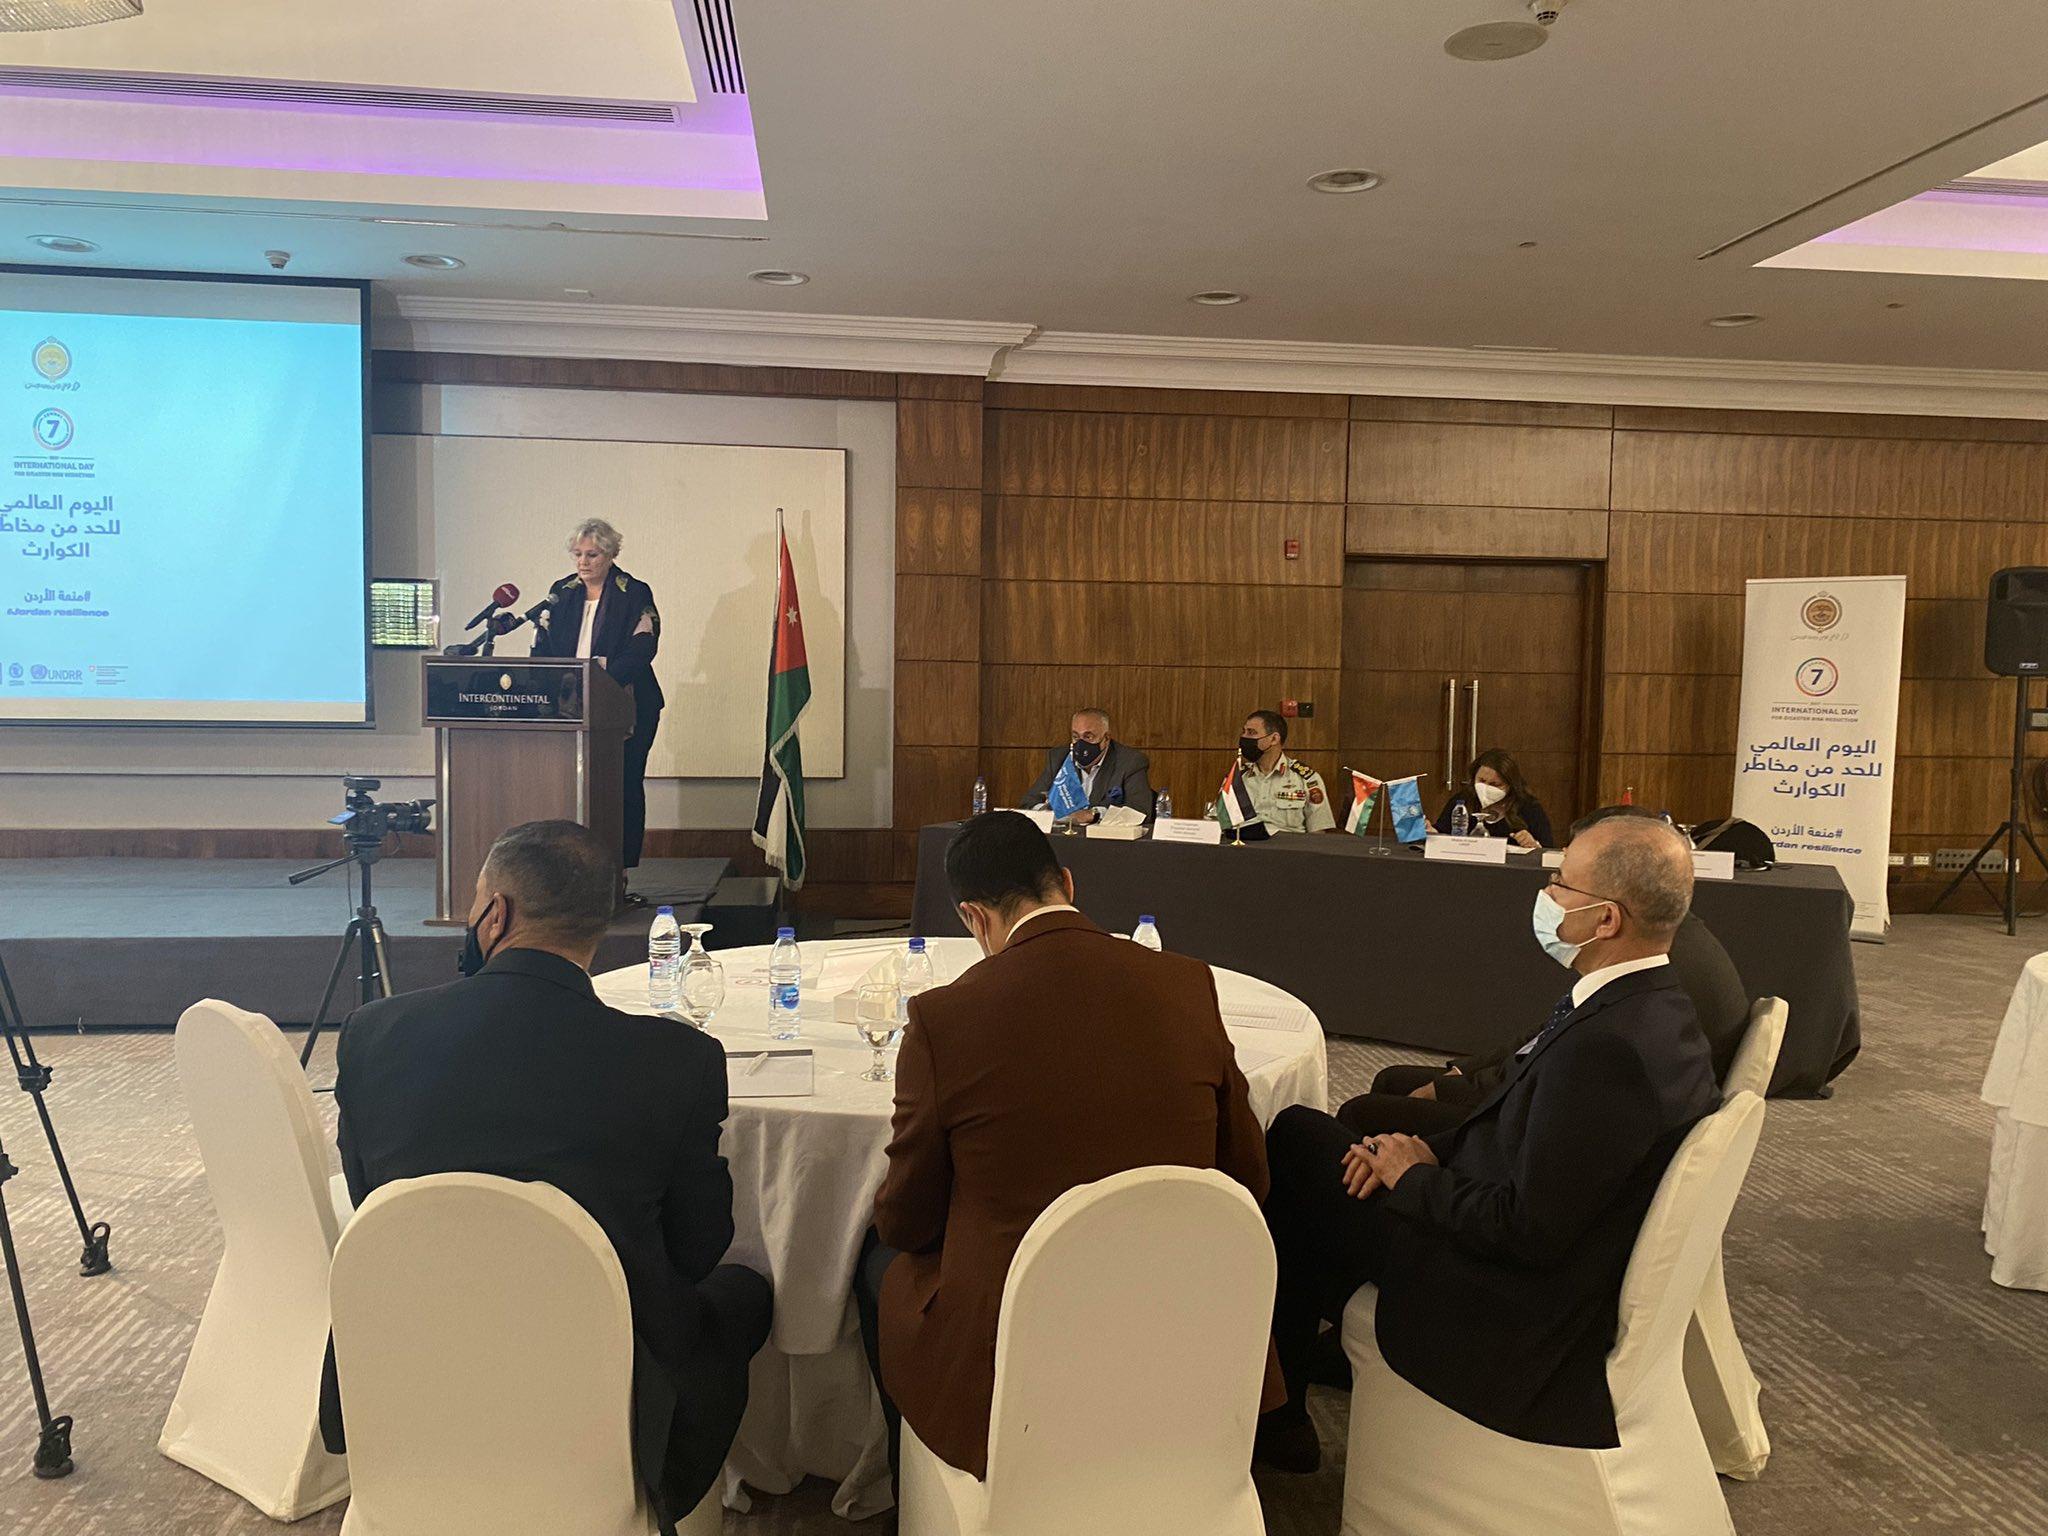 International Day for Disaster Risk Reduction in Jordan: National Consultation Workshop to update the National Strategy for Disaster Risk Reduction